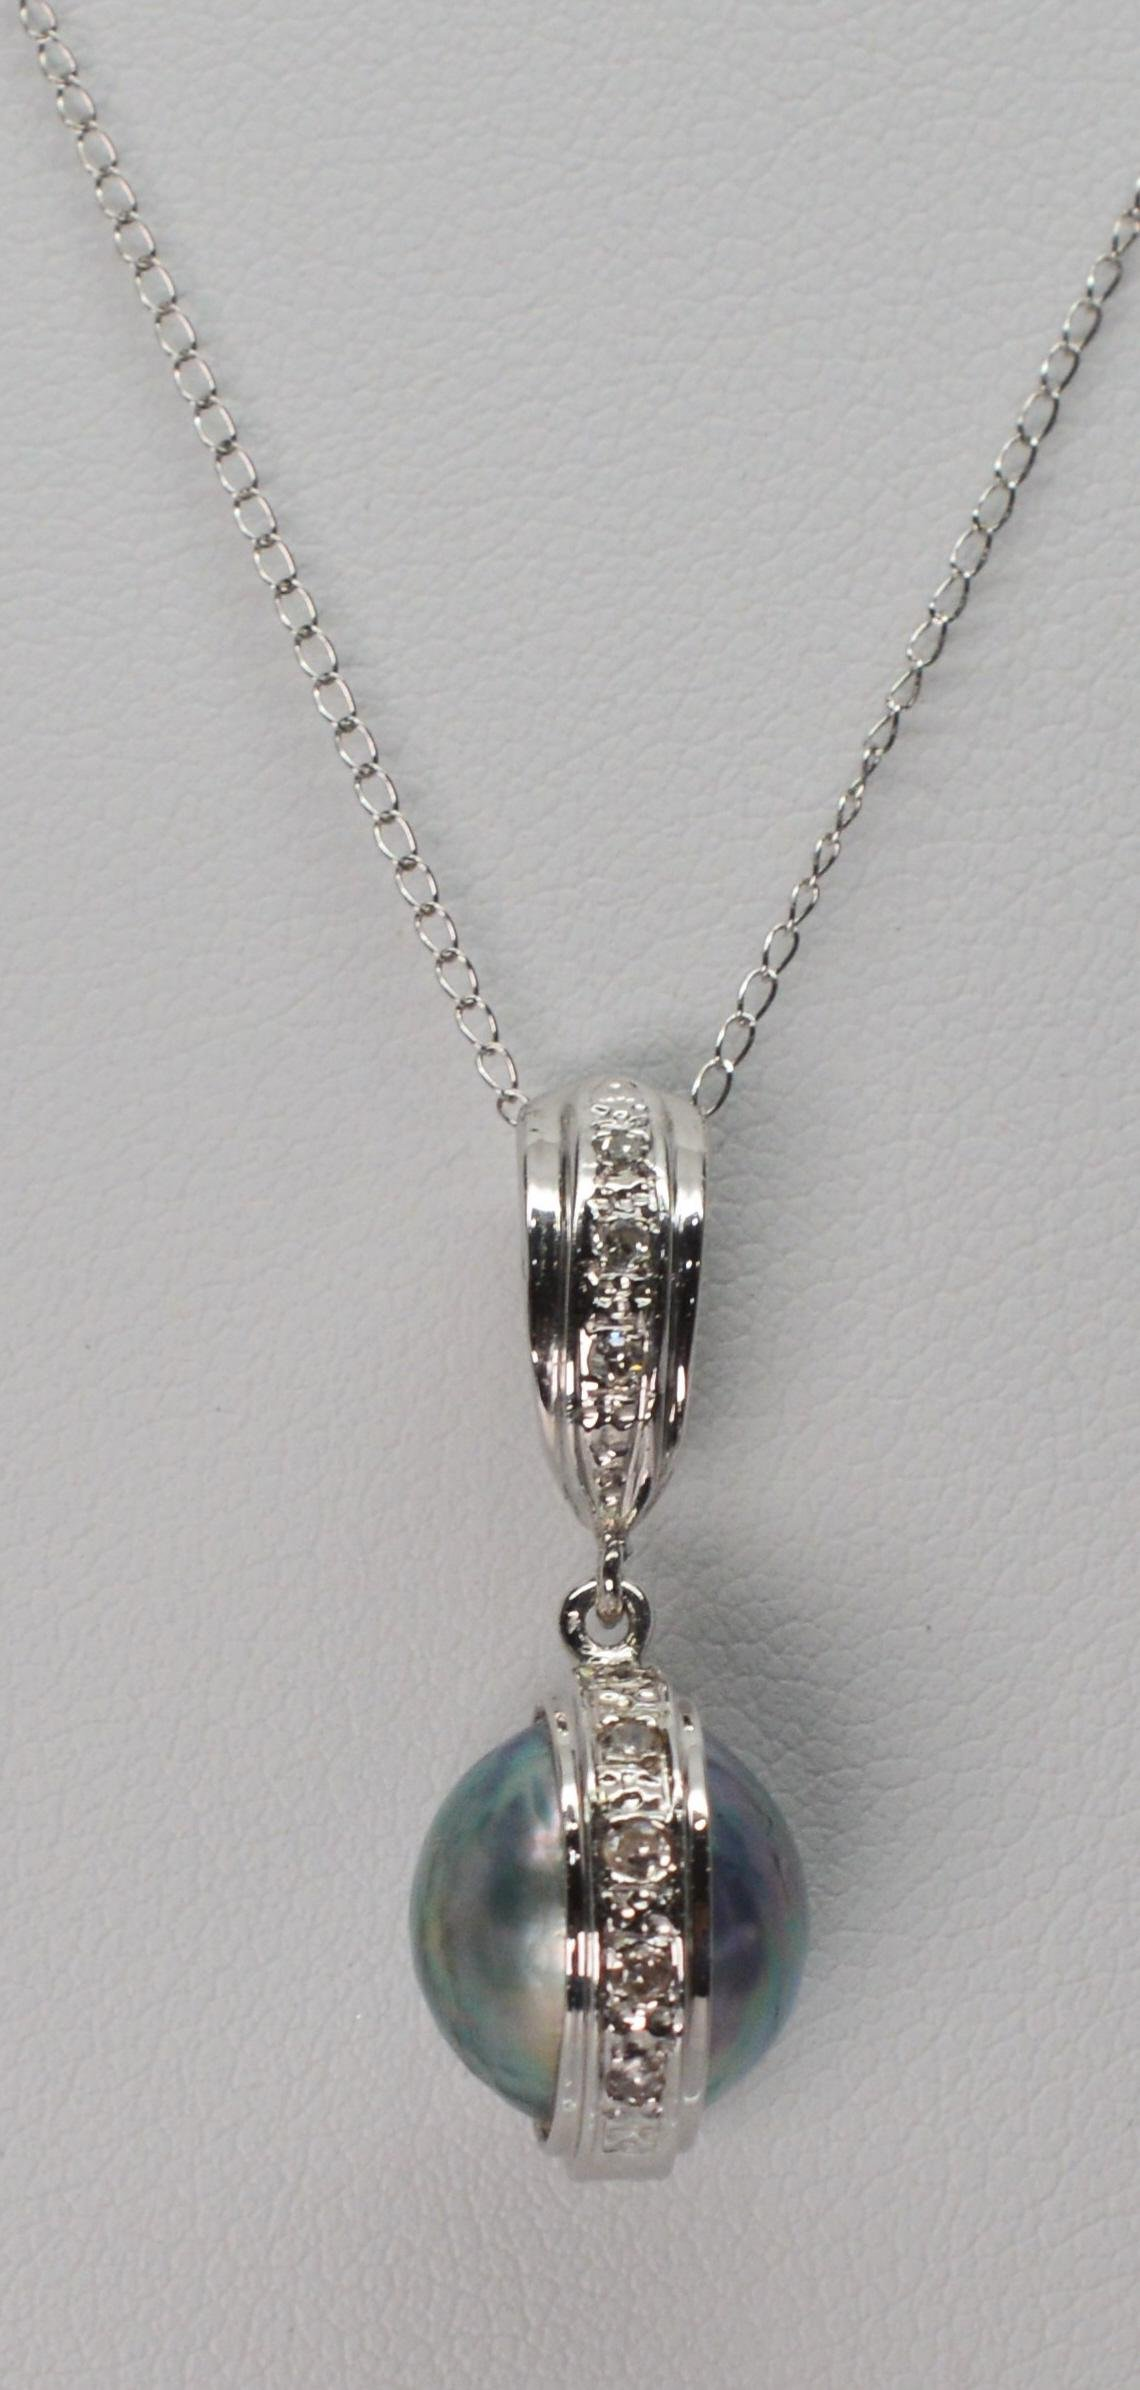 Mobe Pearl 14 K White Gold Diamond Accent Necklace